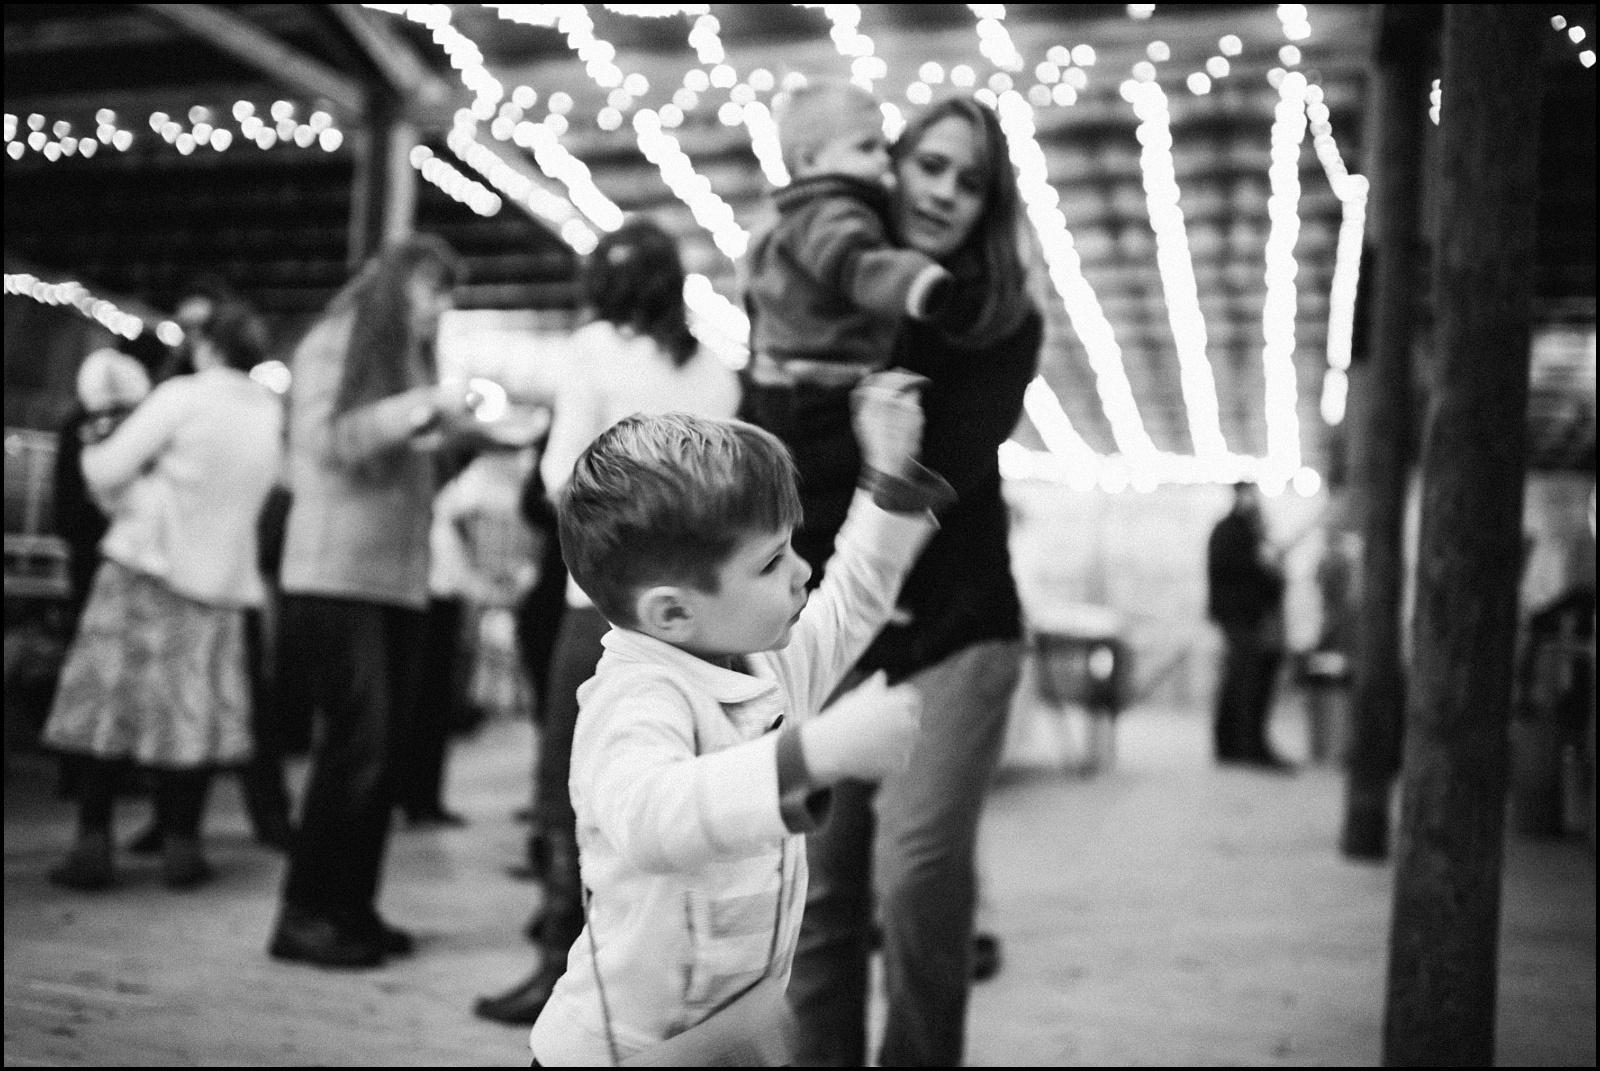 B&W kid dancing